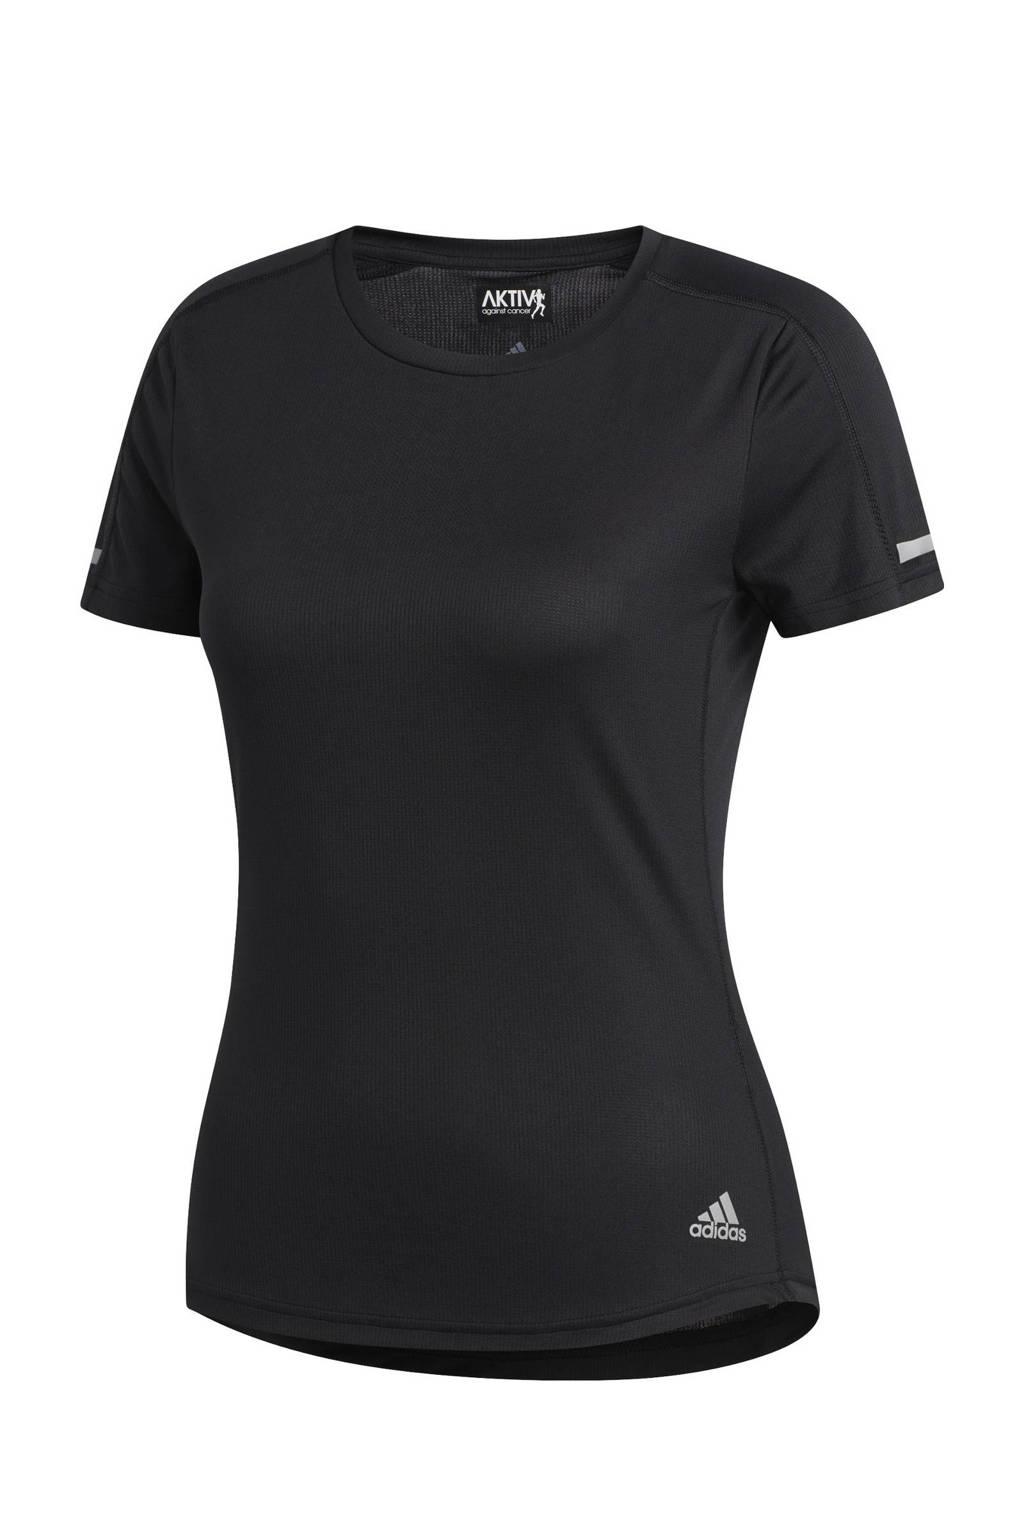 adidas Performance Run It hardloop T-shirt zwart, Zwart